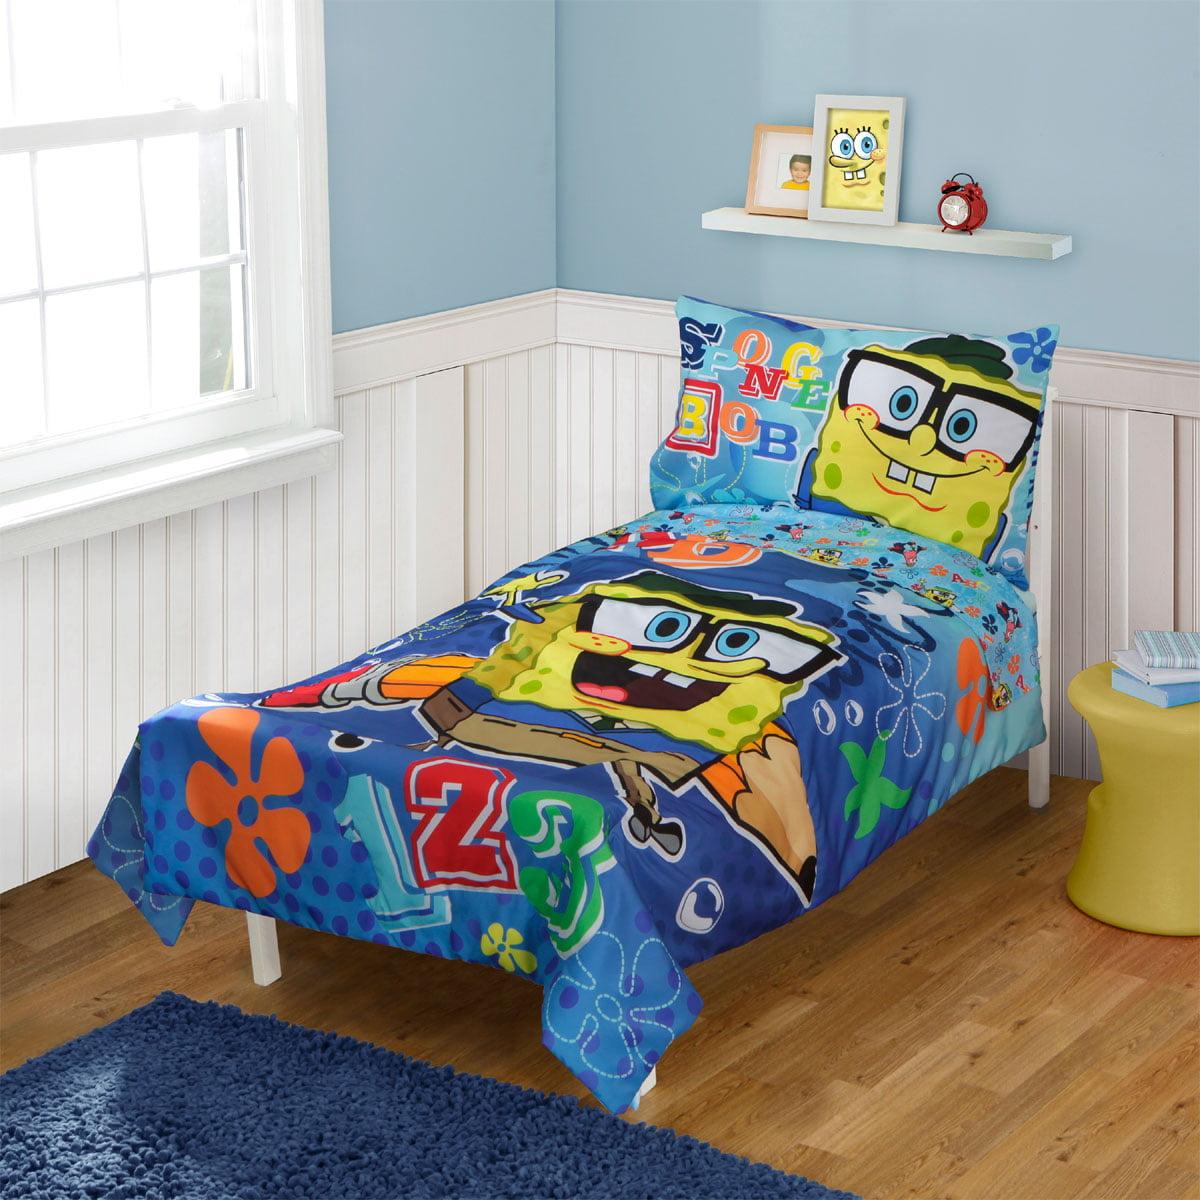 Nickelodeon Spongebob Squarepants 4 pc